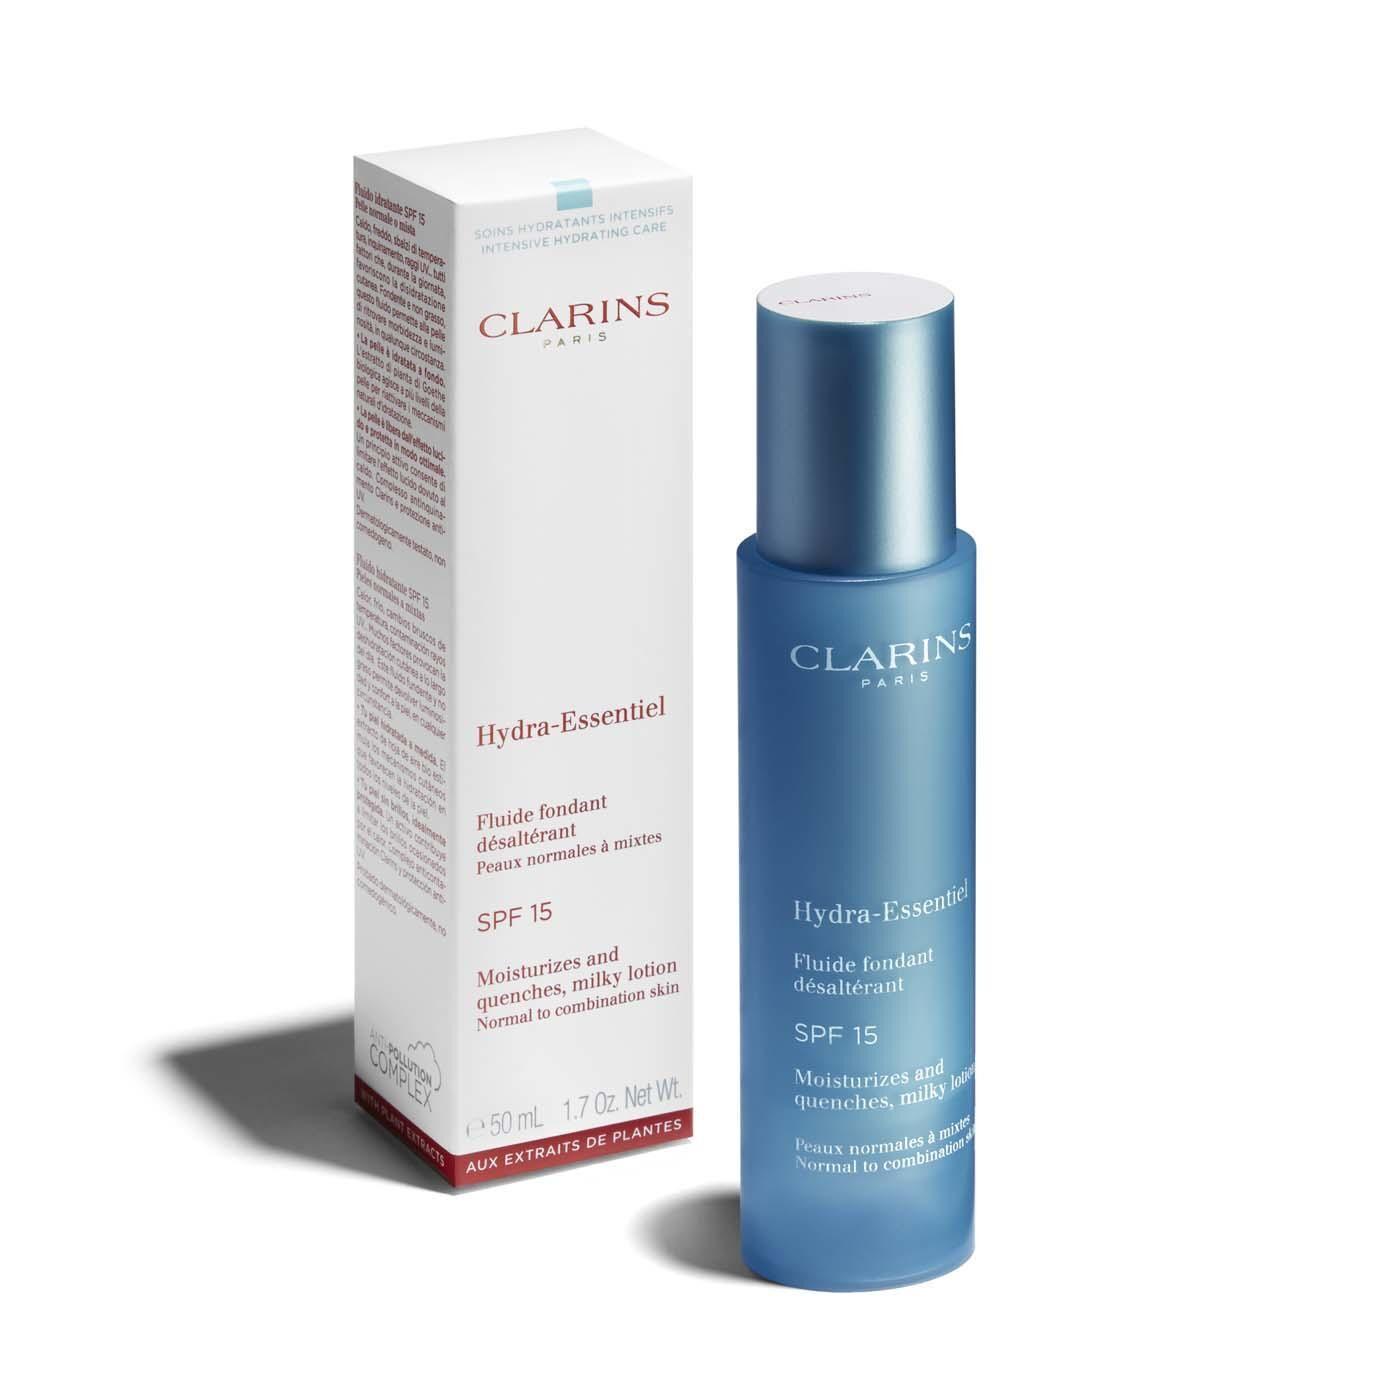 CLARINS Hydra-Essentiel Fluido idratante SPF 15 50 ml